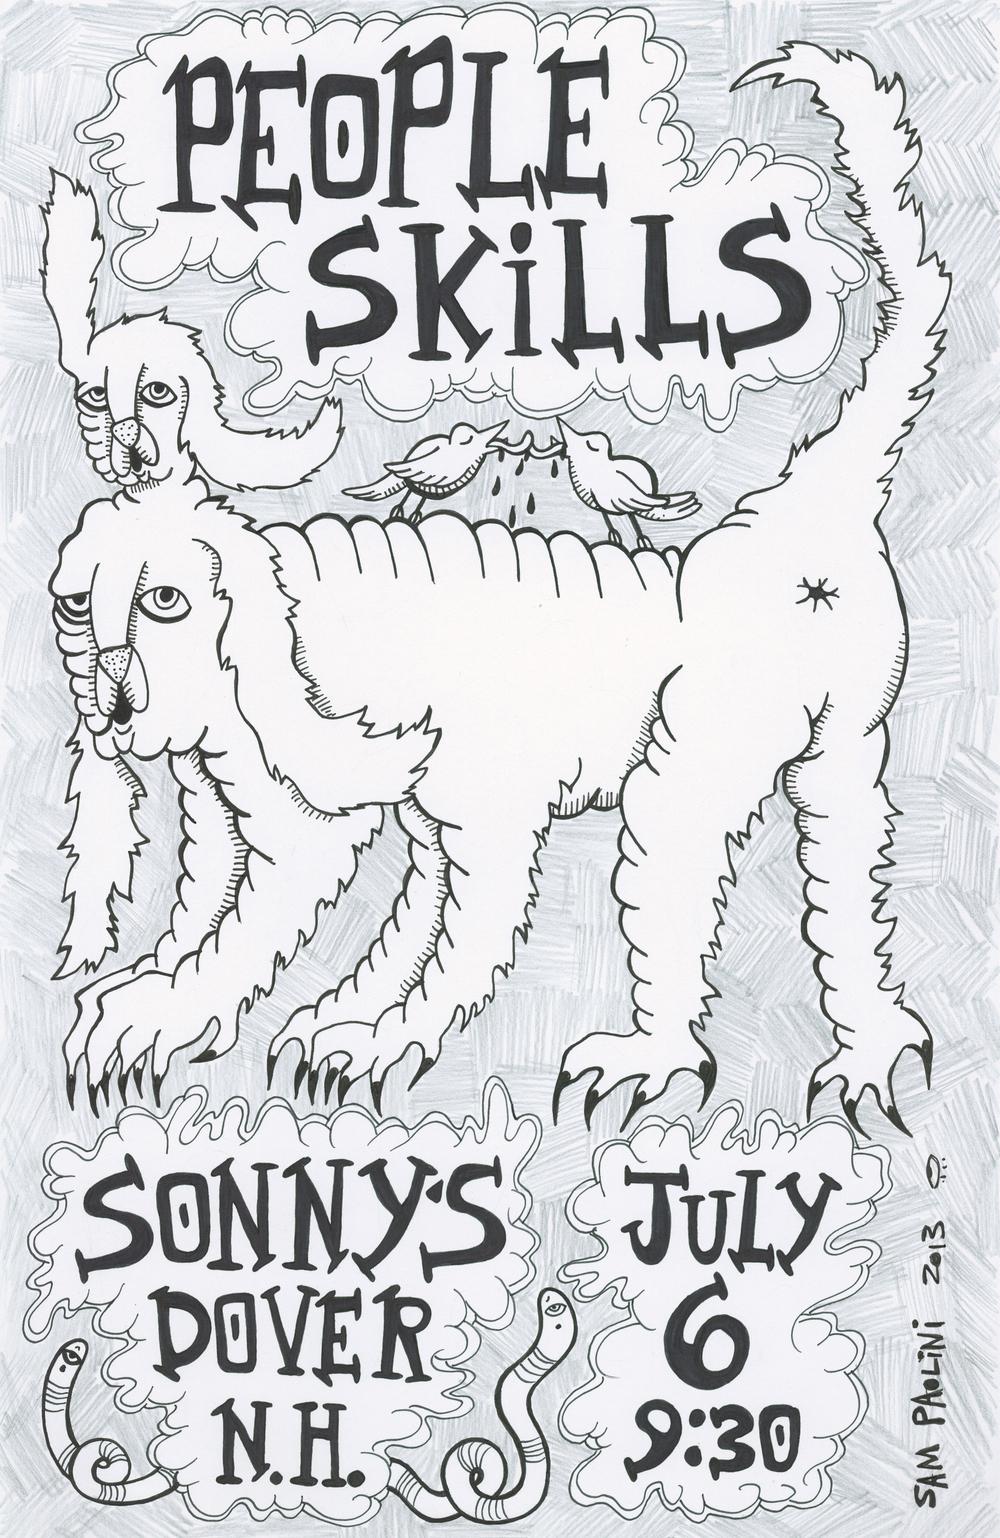 people skills sonnys poster.jpg